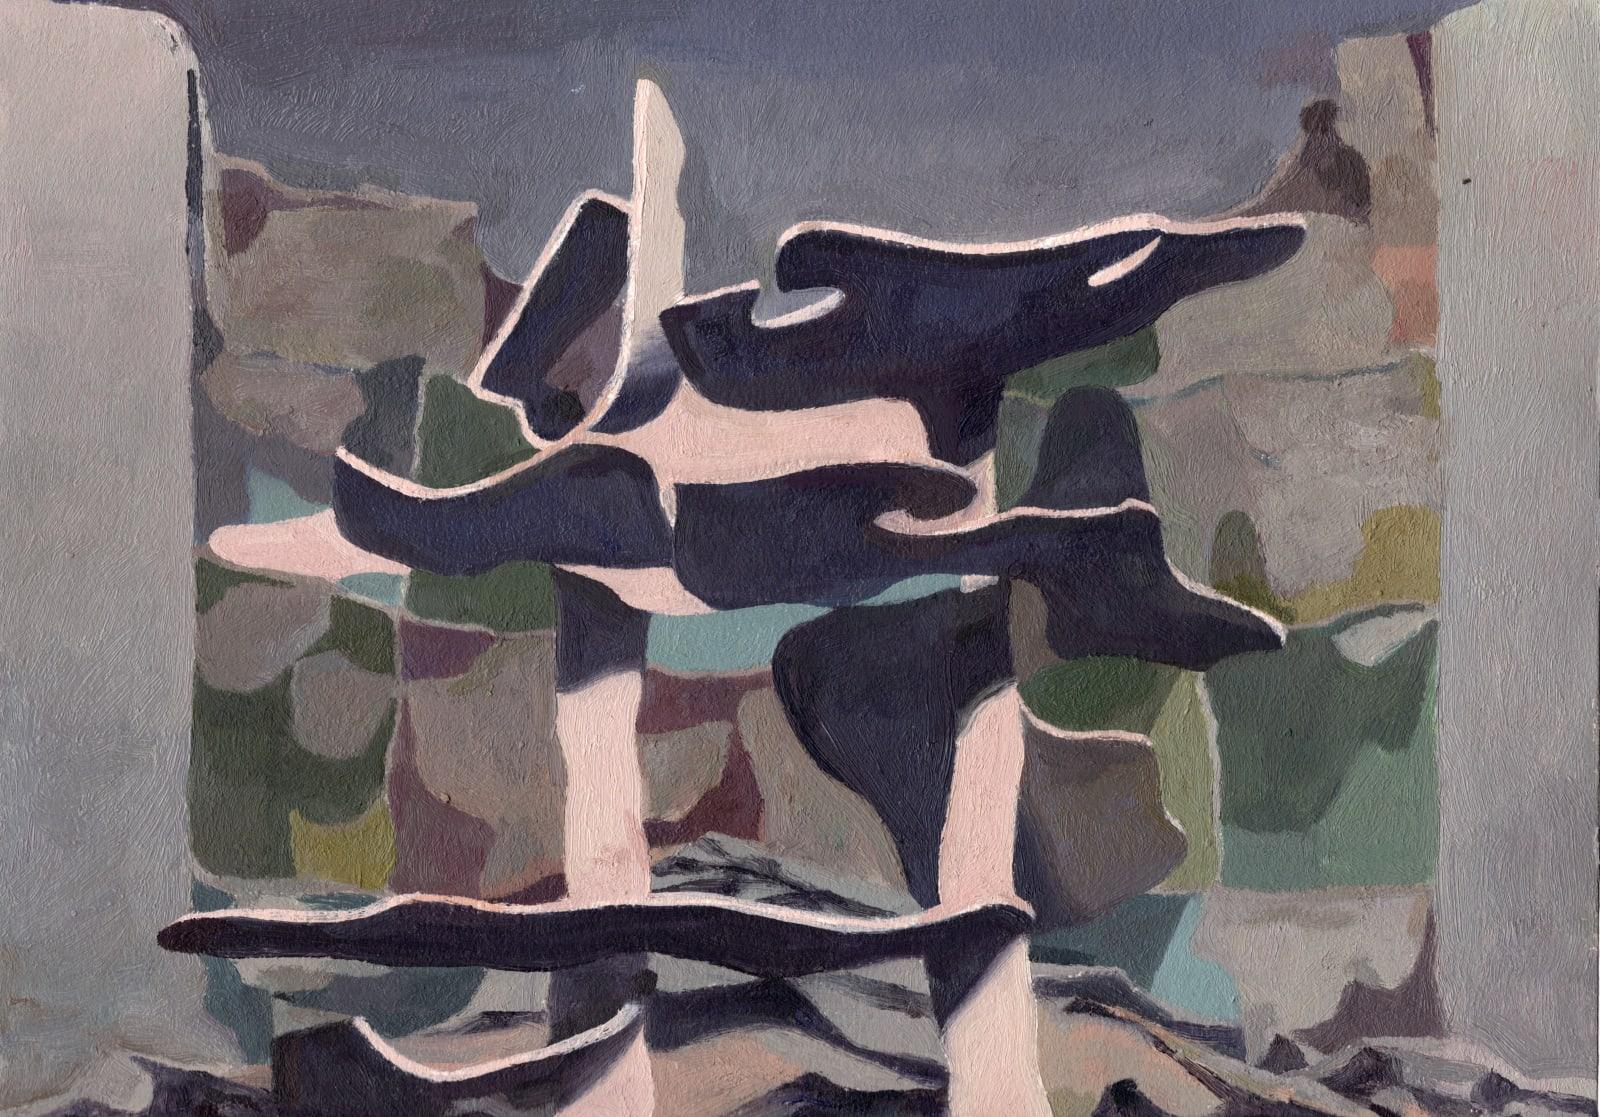 Daniel Dove Puzzler (study), 2019 Oil on paper, unframed 12 1/4 x 16 1/8 in 31.1 x 41 cm